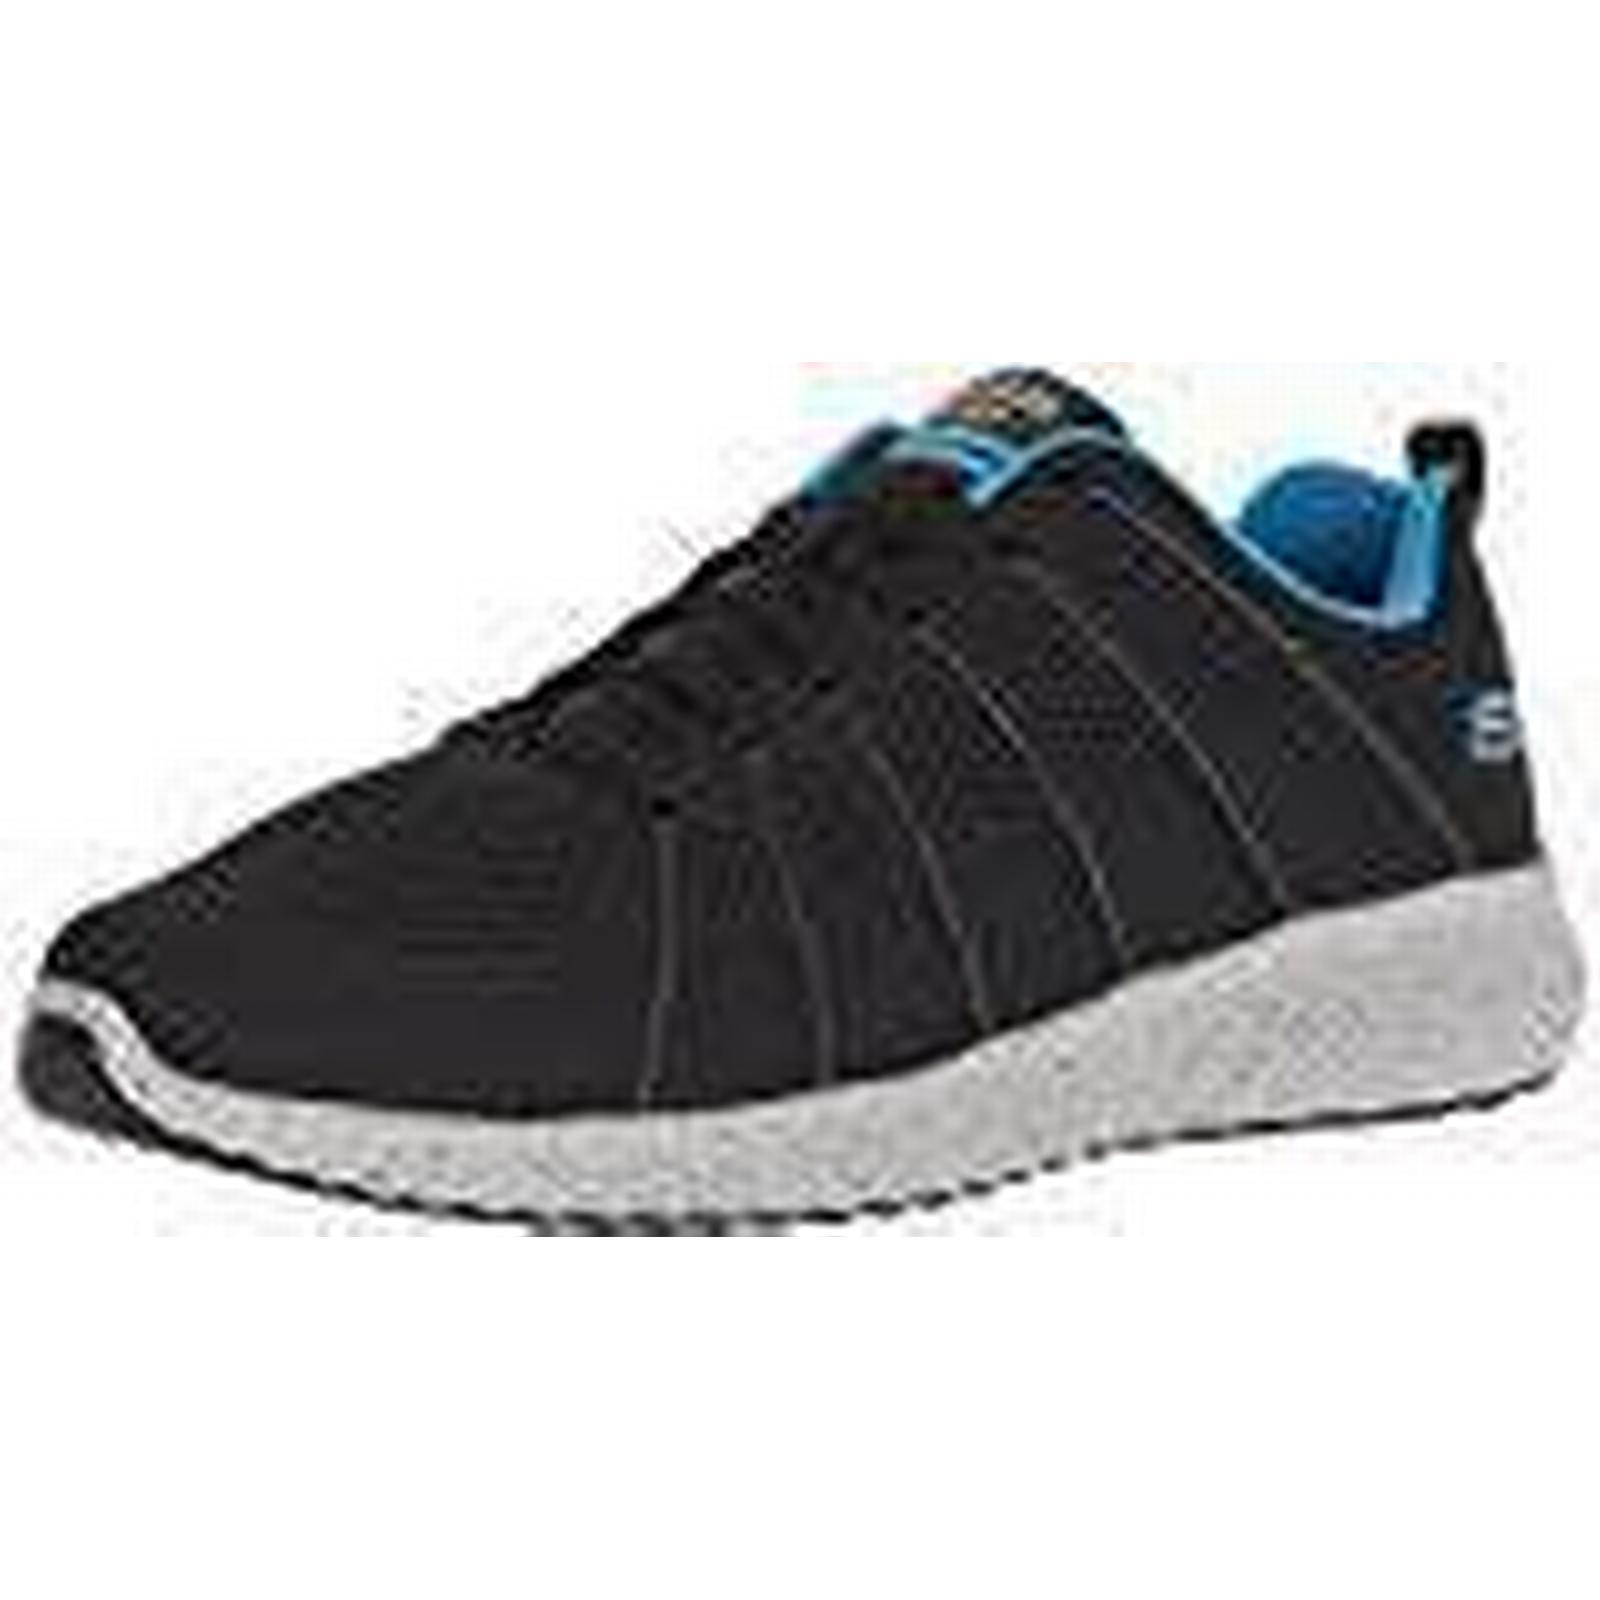 Skechers Men's 52674 UK Trainers, (Black/Blue), 13 UK 52674 48.5 EU a5b9ca